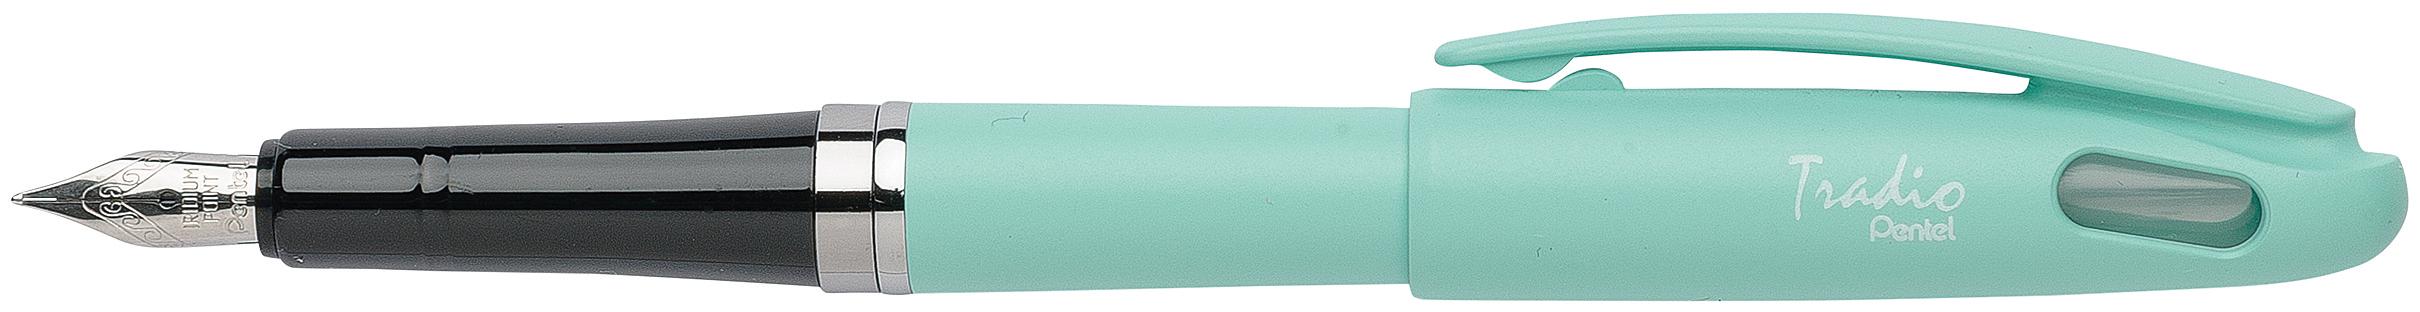 Pentel Tradio Pastel - Stylo plume - corps vert